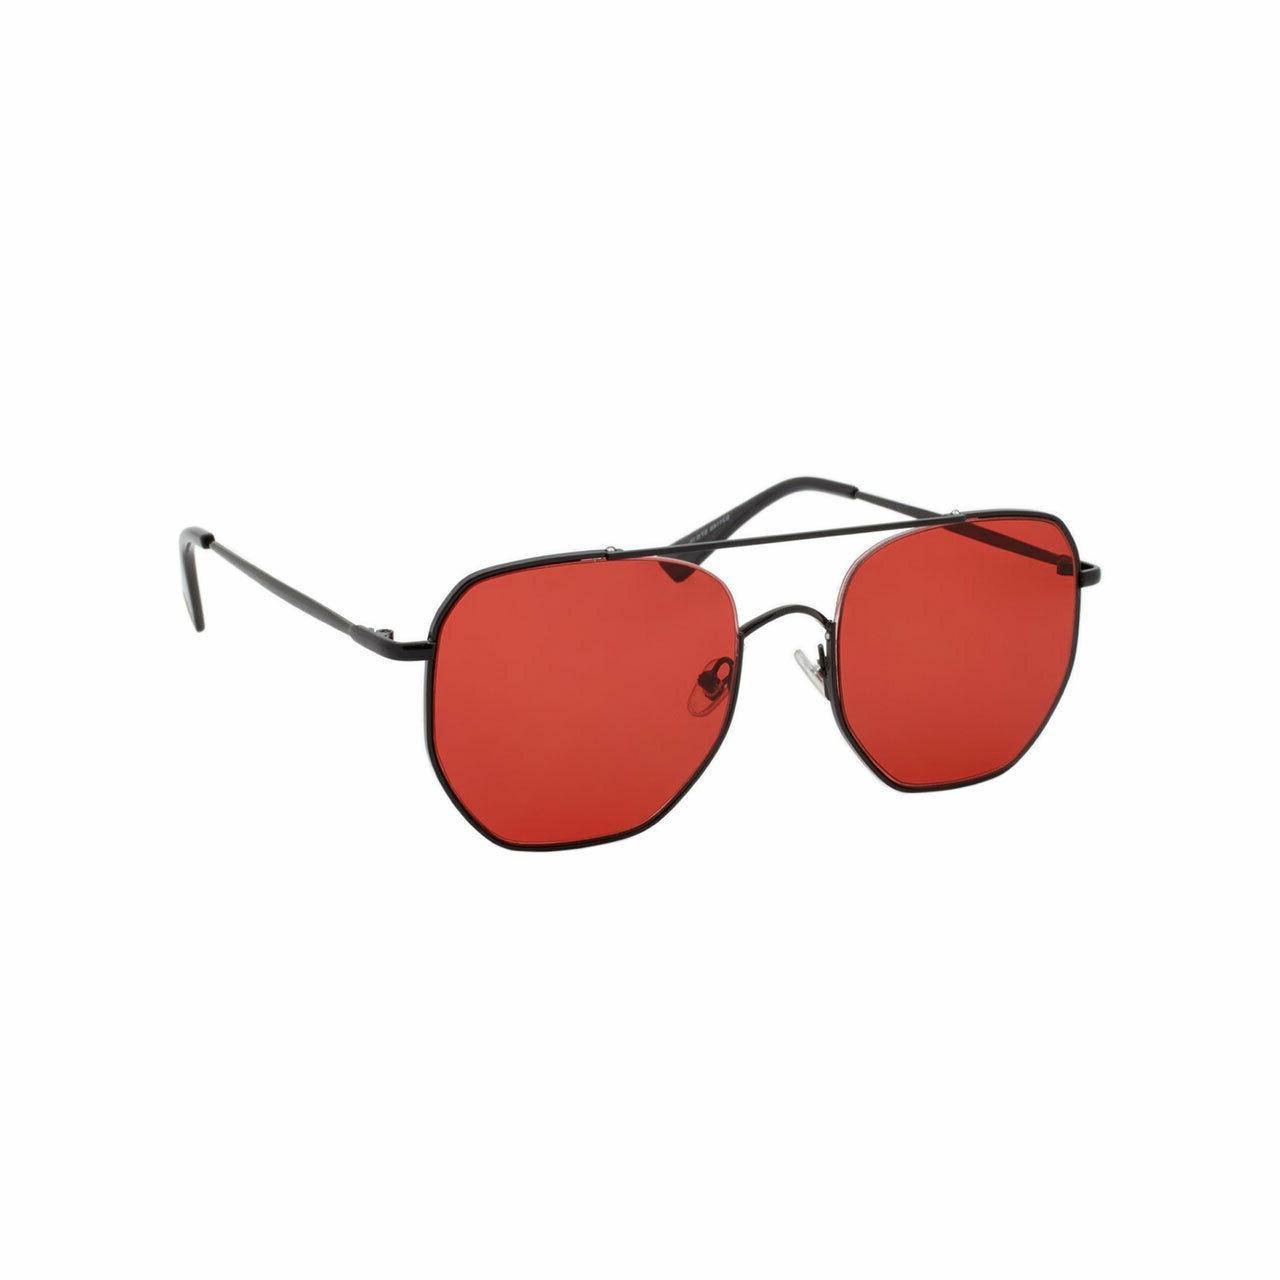 Bulk Fashion Sunglasses Eyeglasses Men